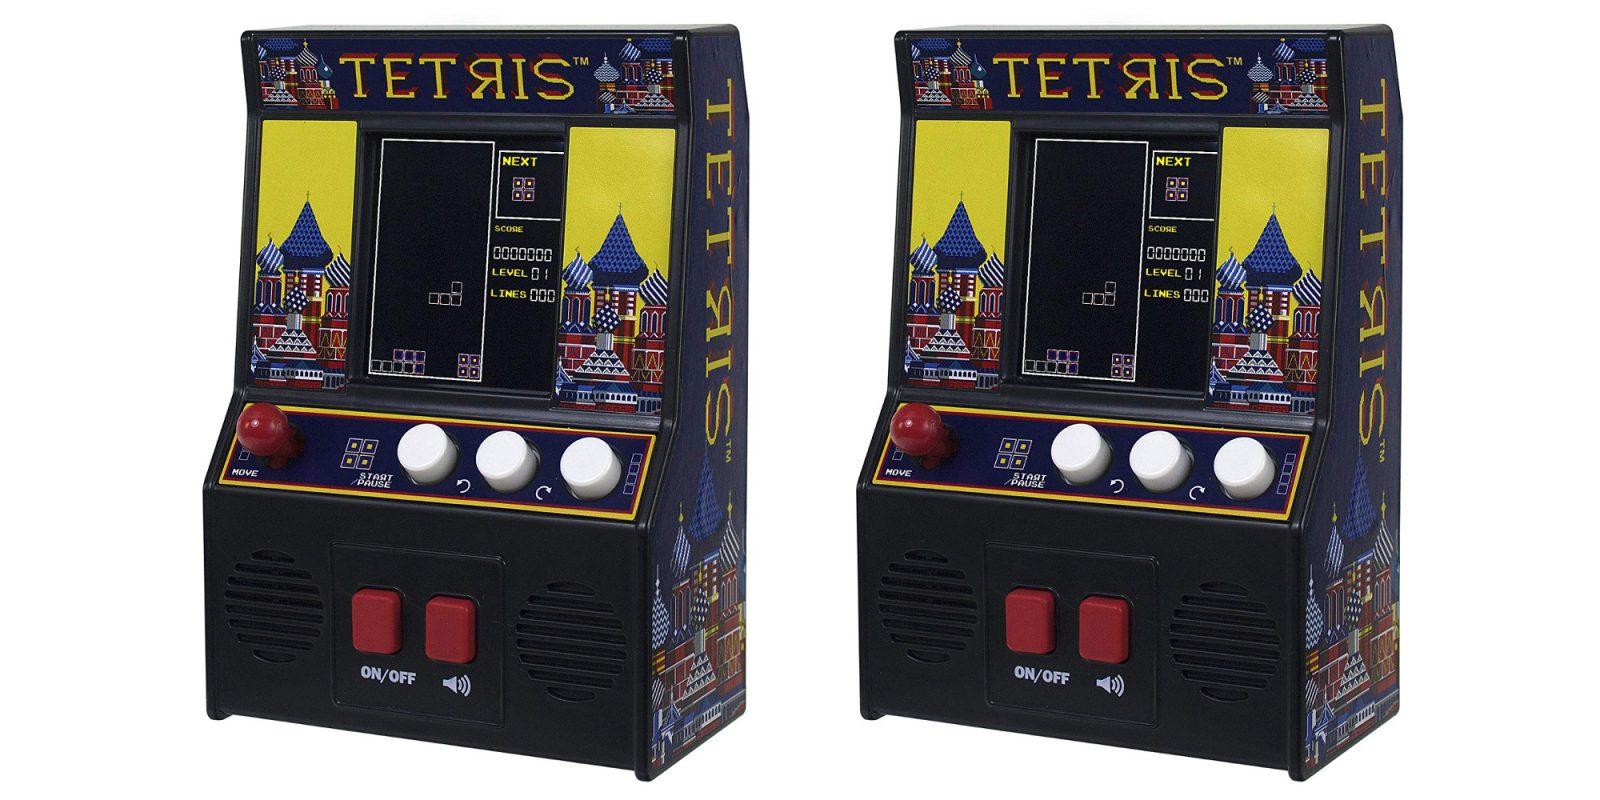 Put a mini Tetris arcade machine in your pocket for $8.50 (Reg. $16+)